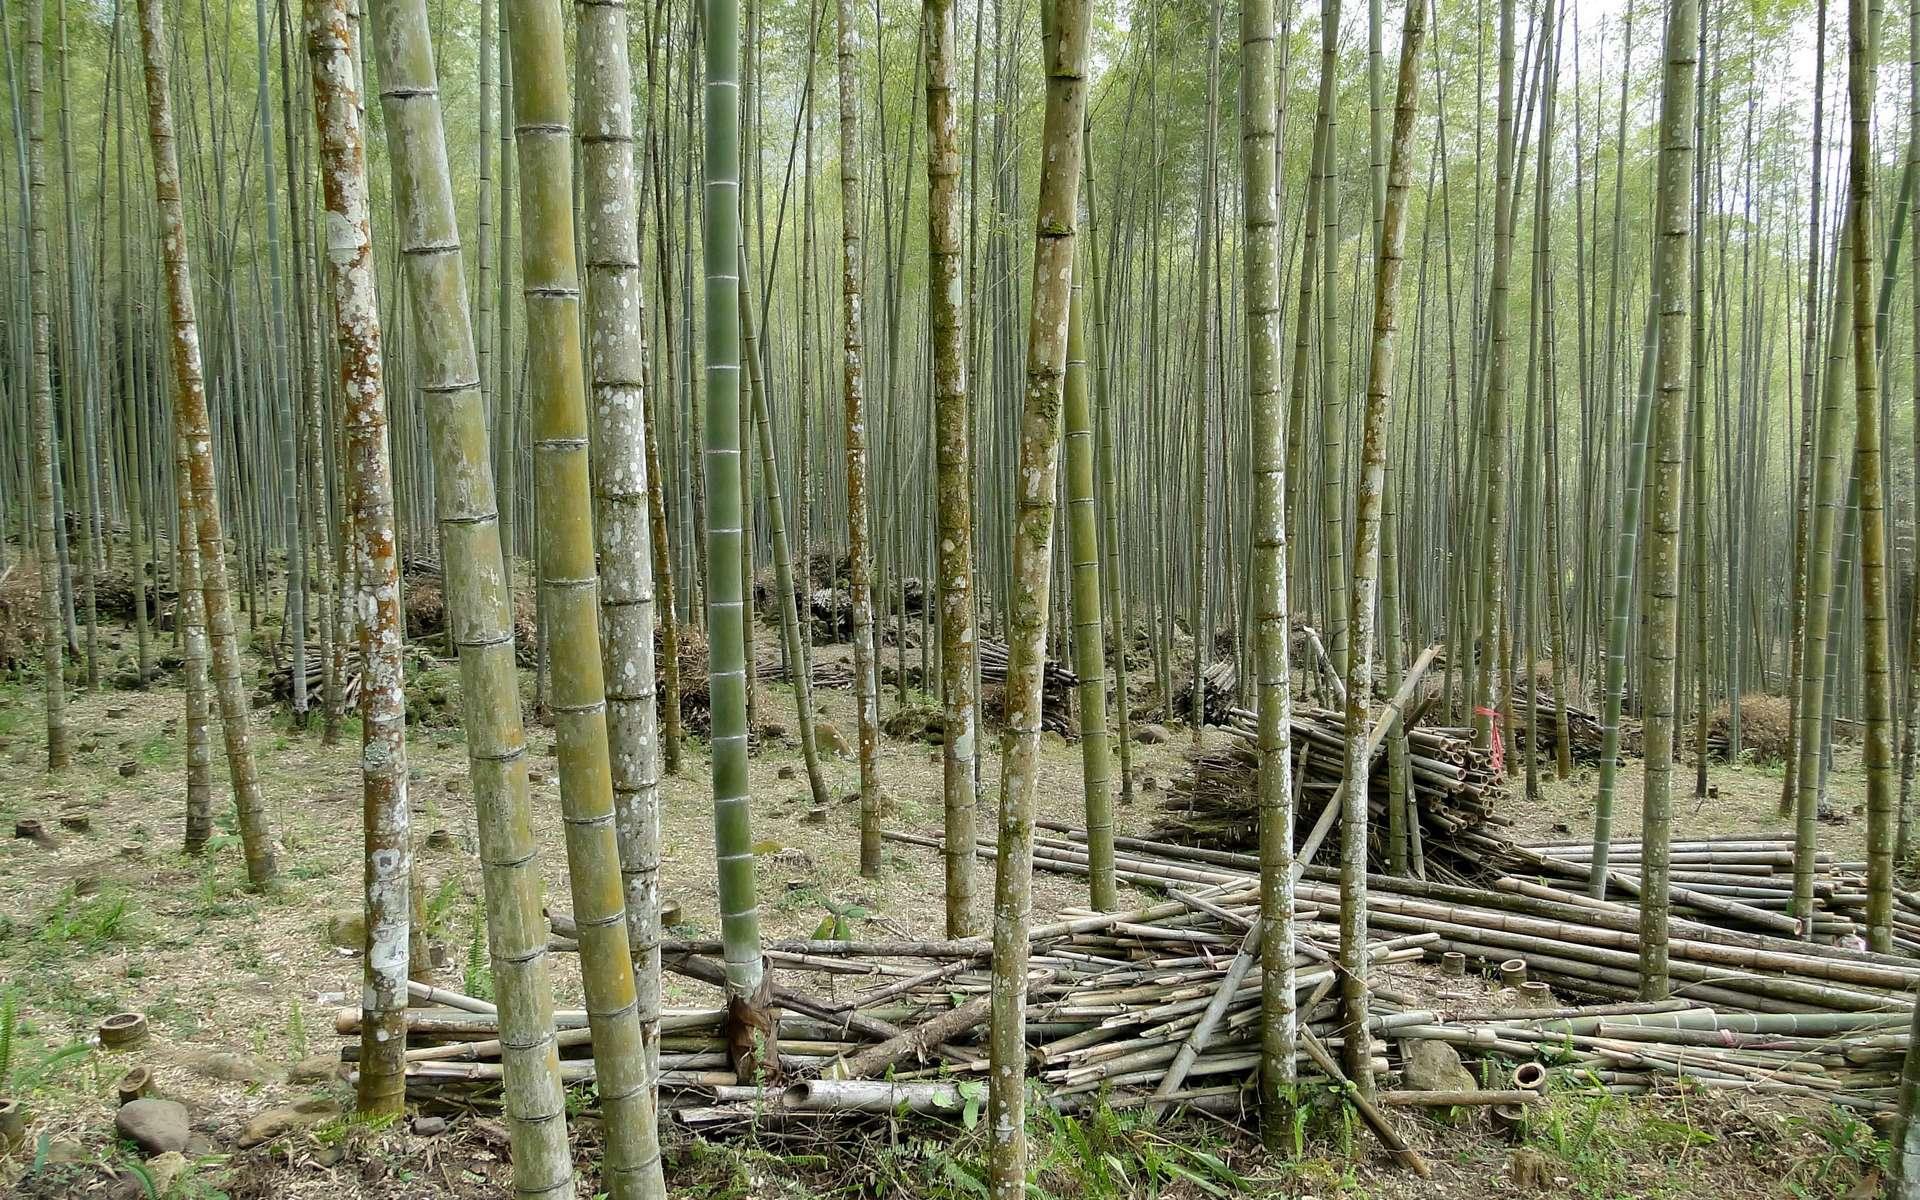 Forêt de Bambou à Taiwan © Bernard Gagnon, WIKIMEDIA, CC-BY-SA-3.0